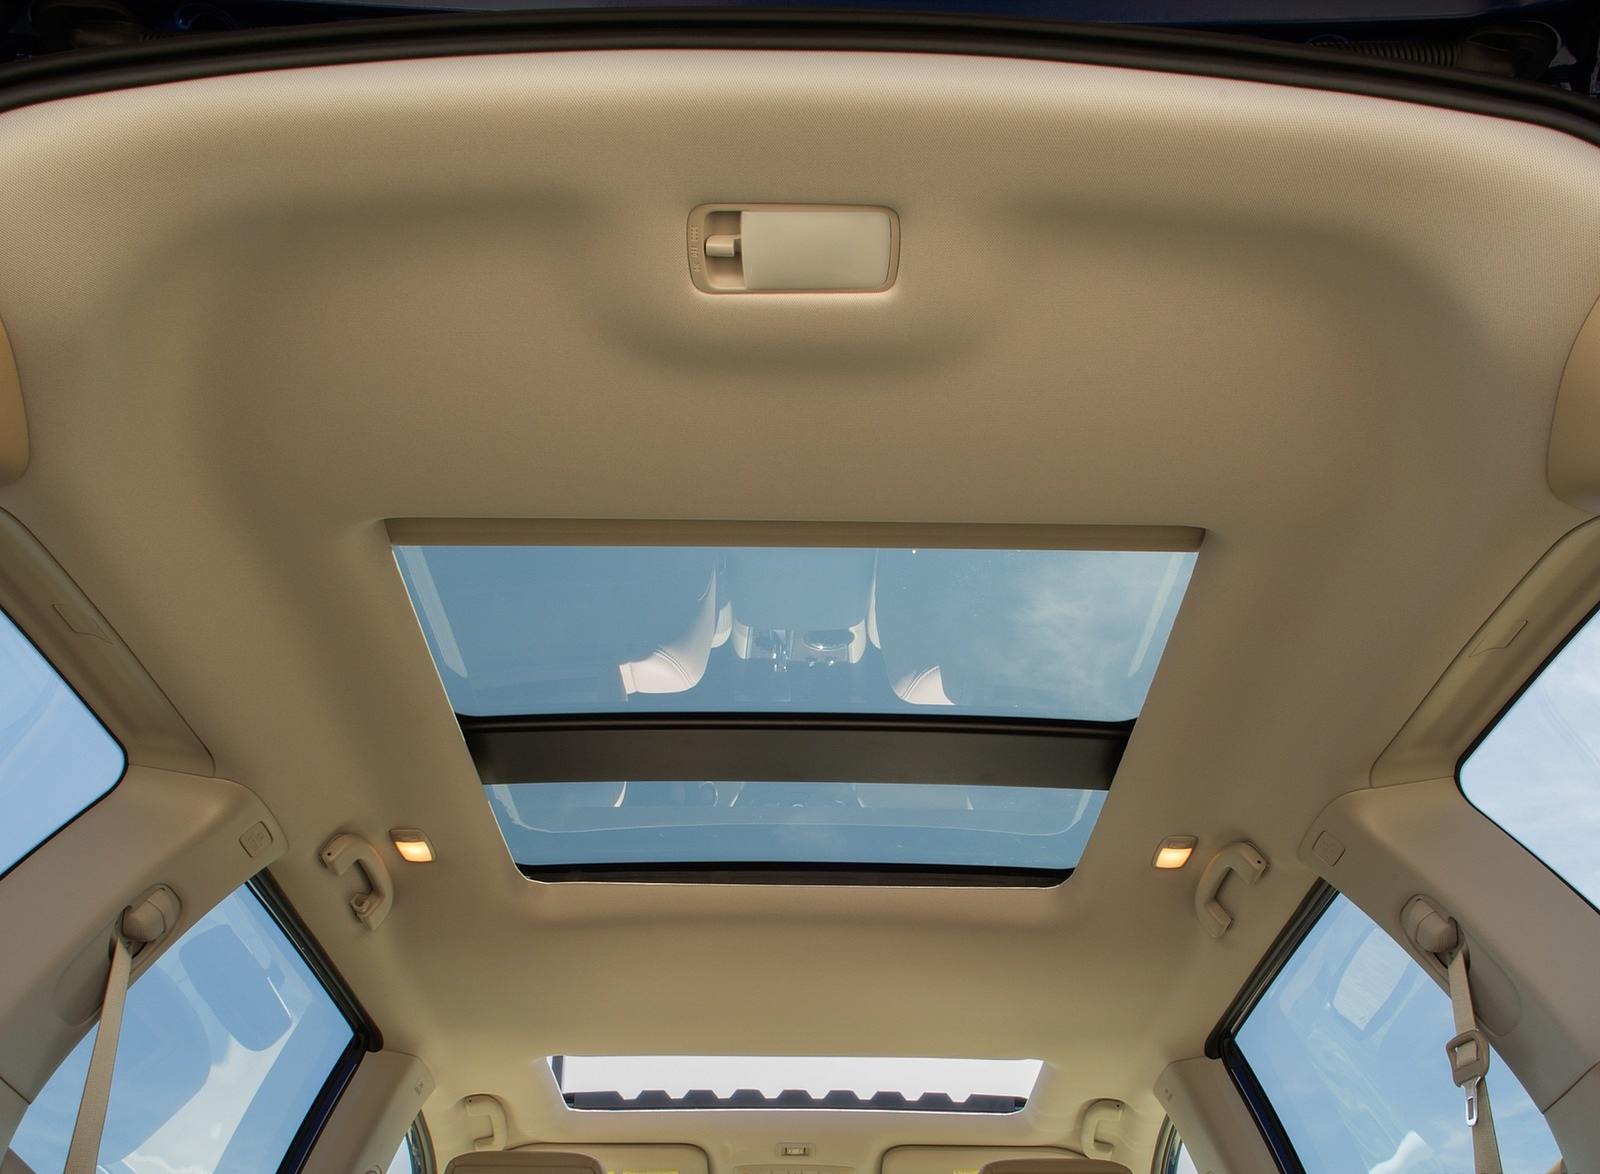 2020 Nissan Pathfinder Platinum 4WD Panoramic Roof Wallpapers (11)